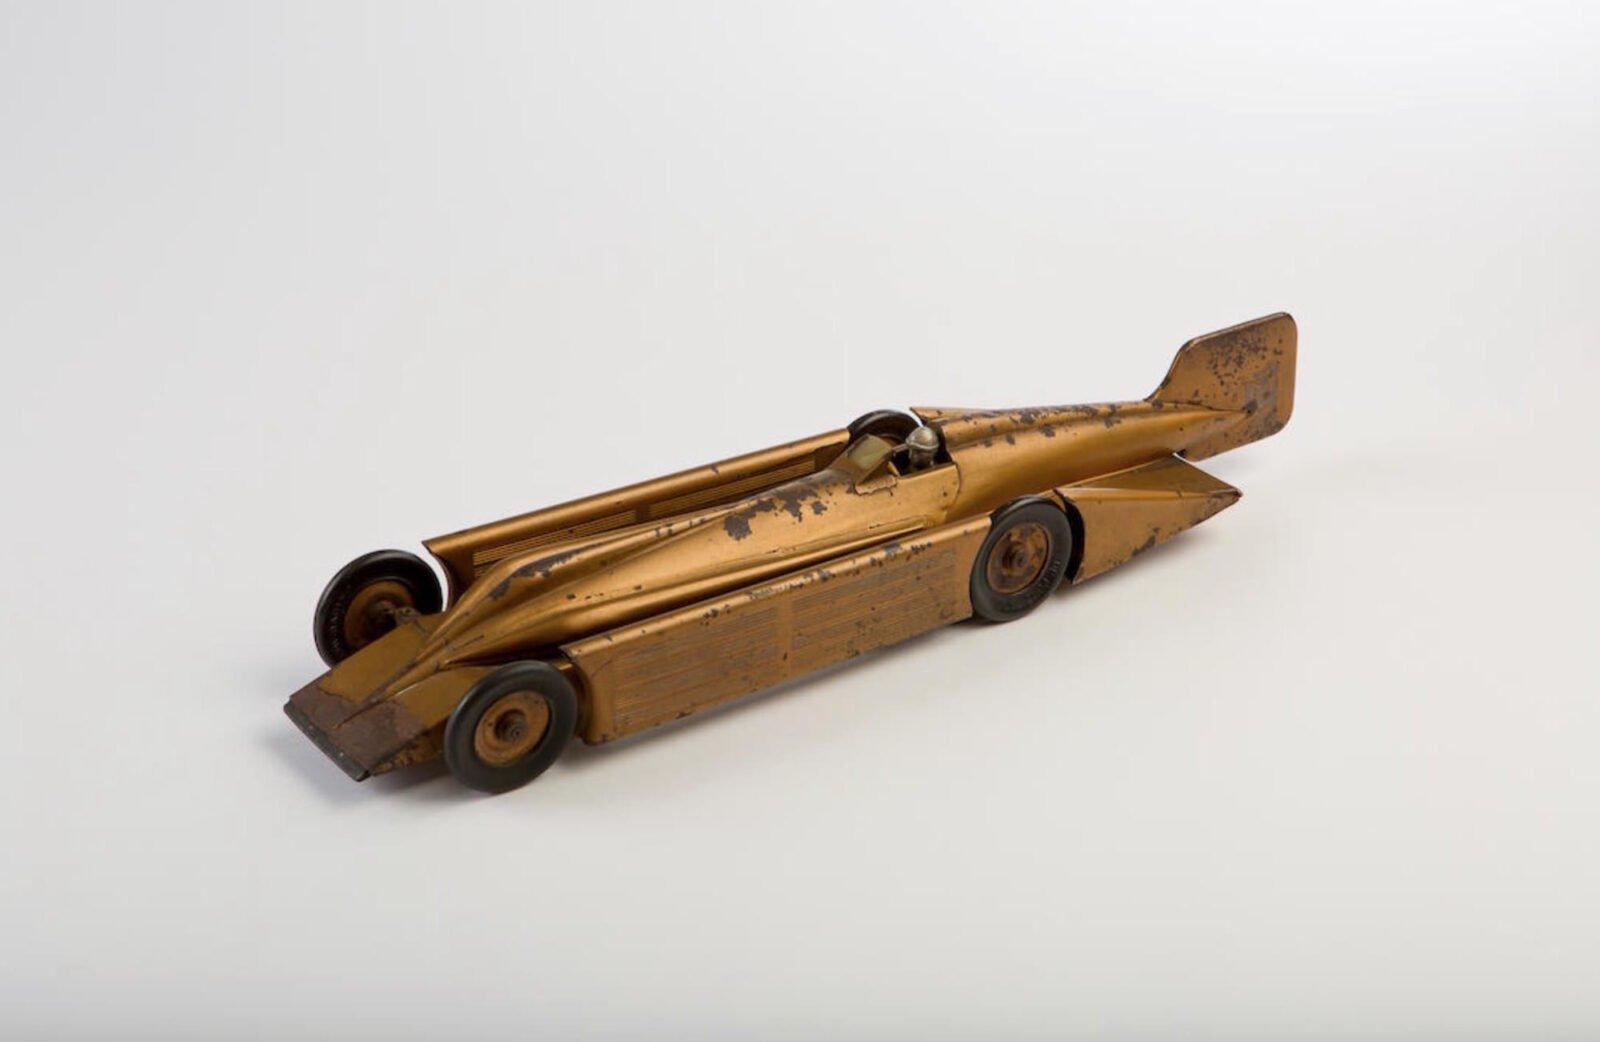 Clockwork Tinplate Toy Cars 1600x1042 - Clockwork Tinplate Toy Cars